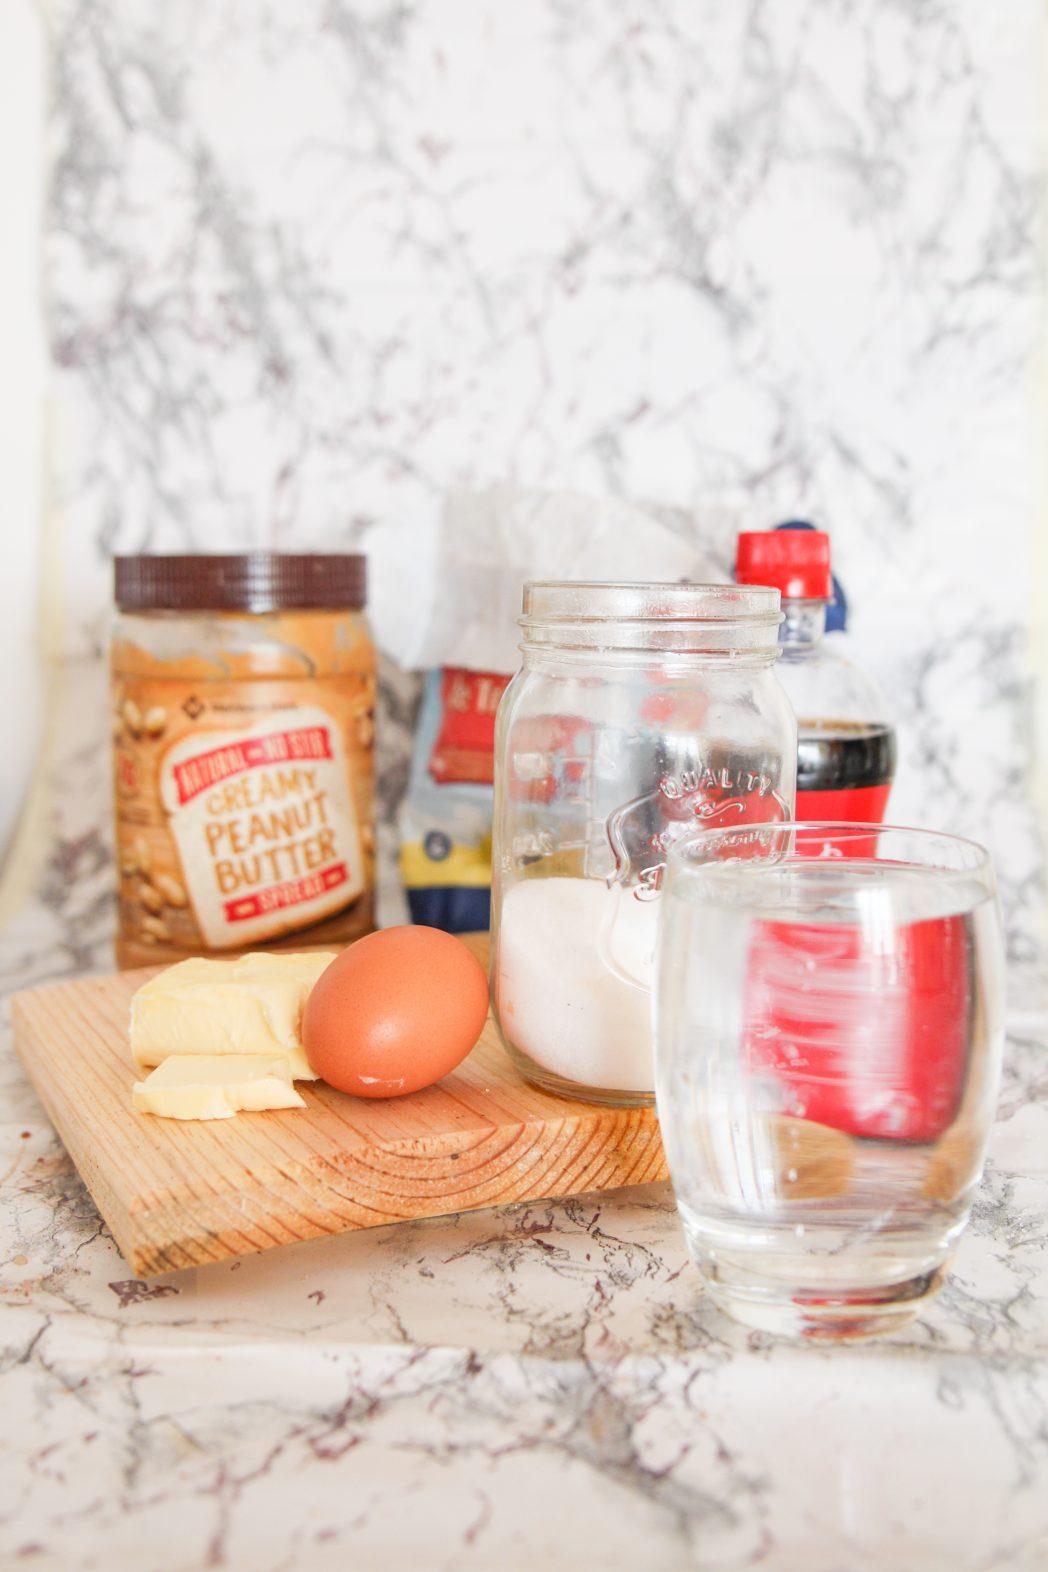 Fried Peanut Butter Balls Recipe!